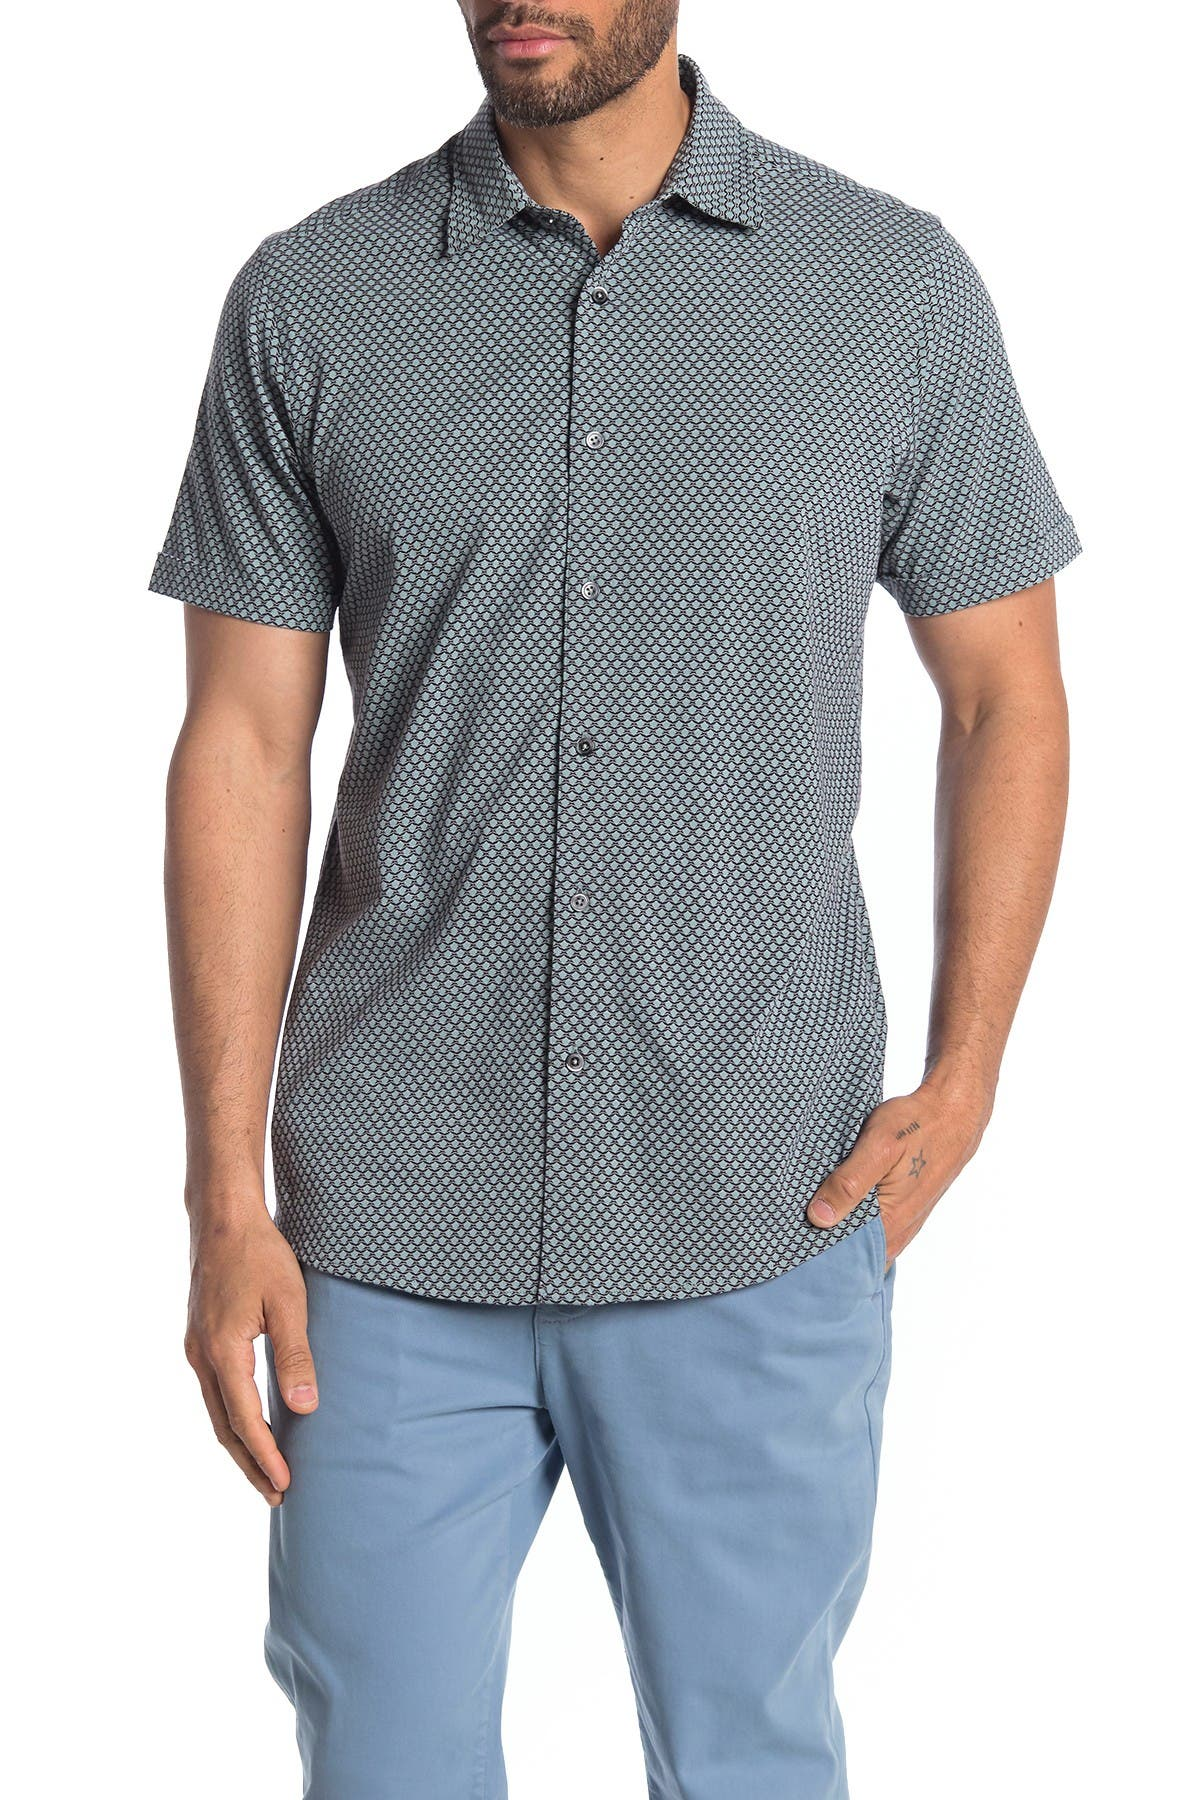 Image of COASTAORO Diamonte Short Sleeve Jersey Shirt